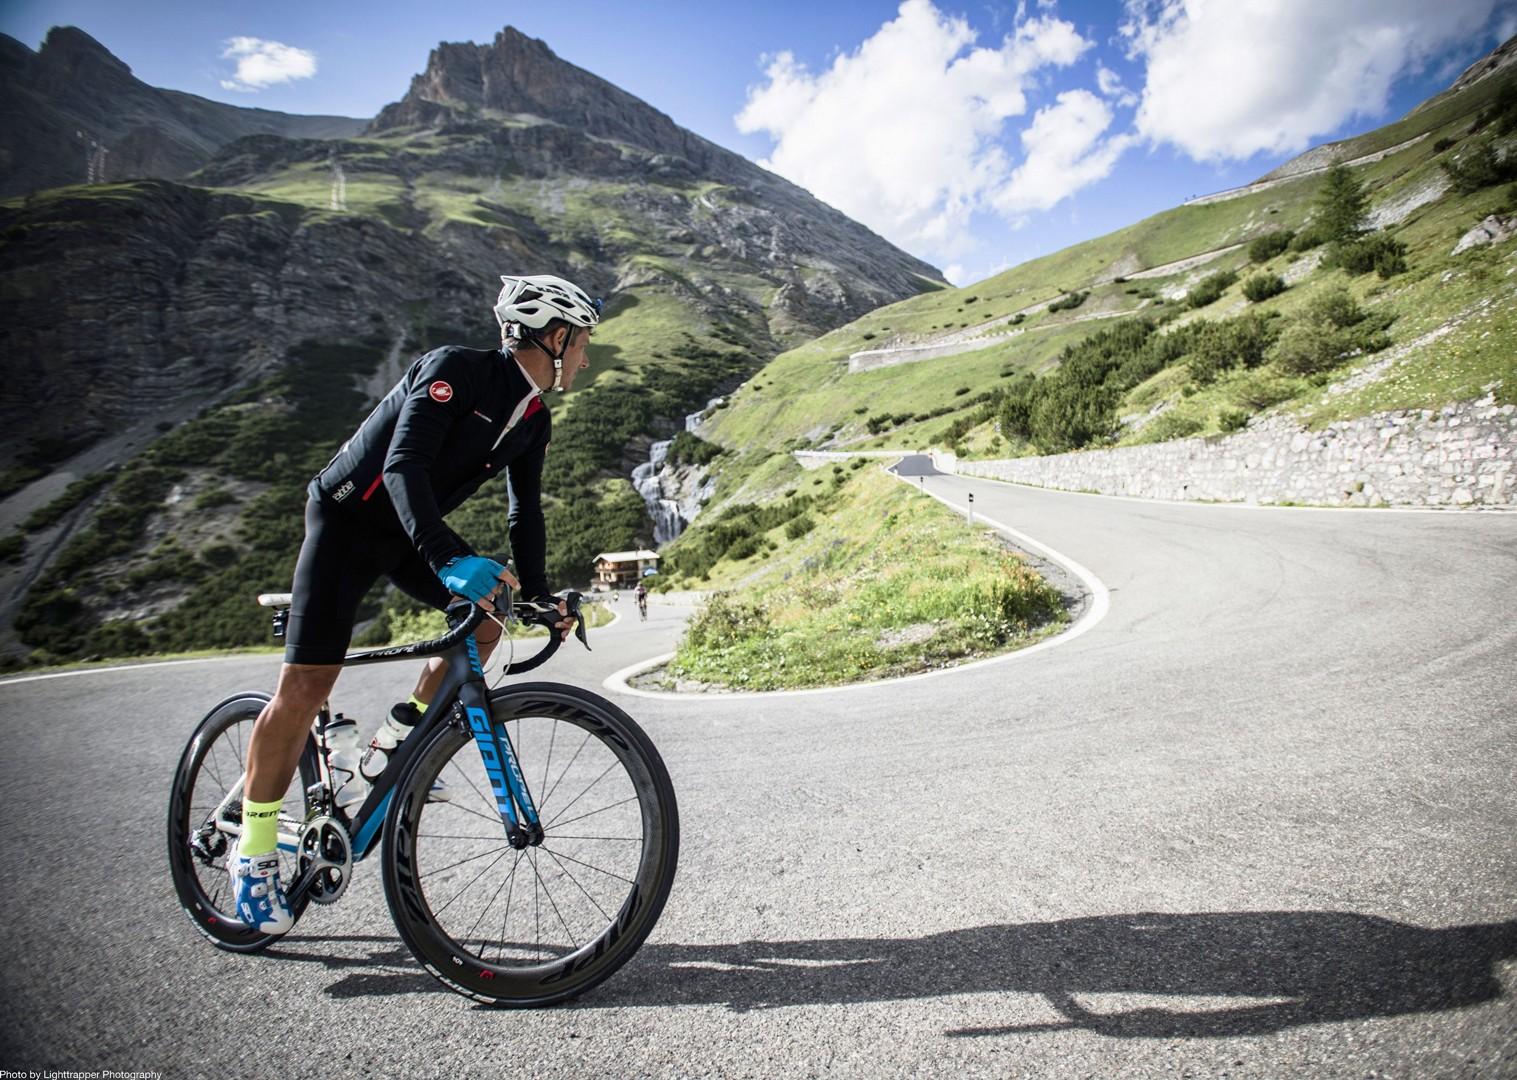 italian-alps-guided-road-cycling-holiday.jpg - Italy - Italian Alps - Guided Road Cycling Holiday - Road Cycling